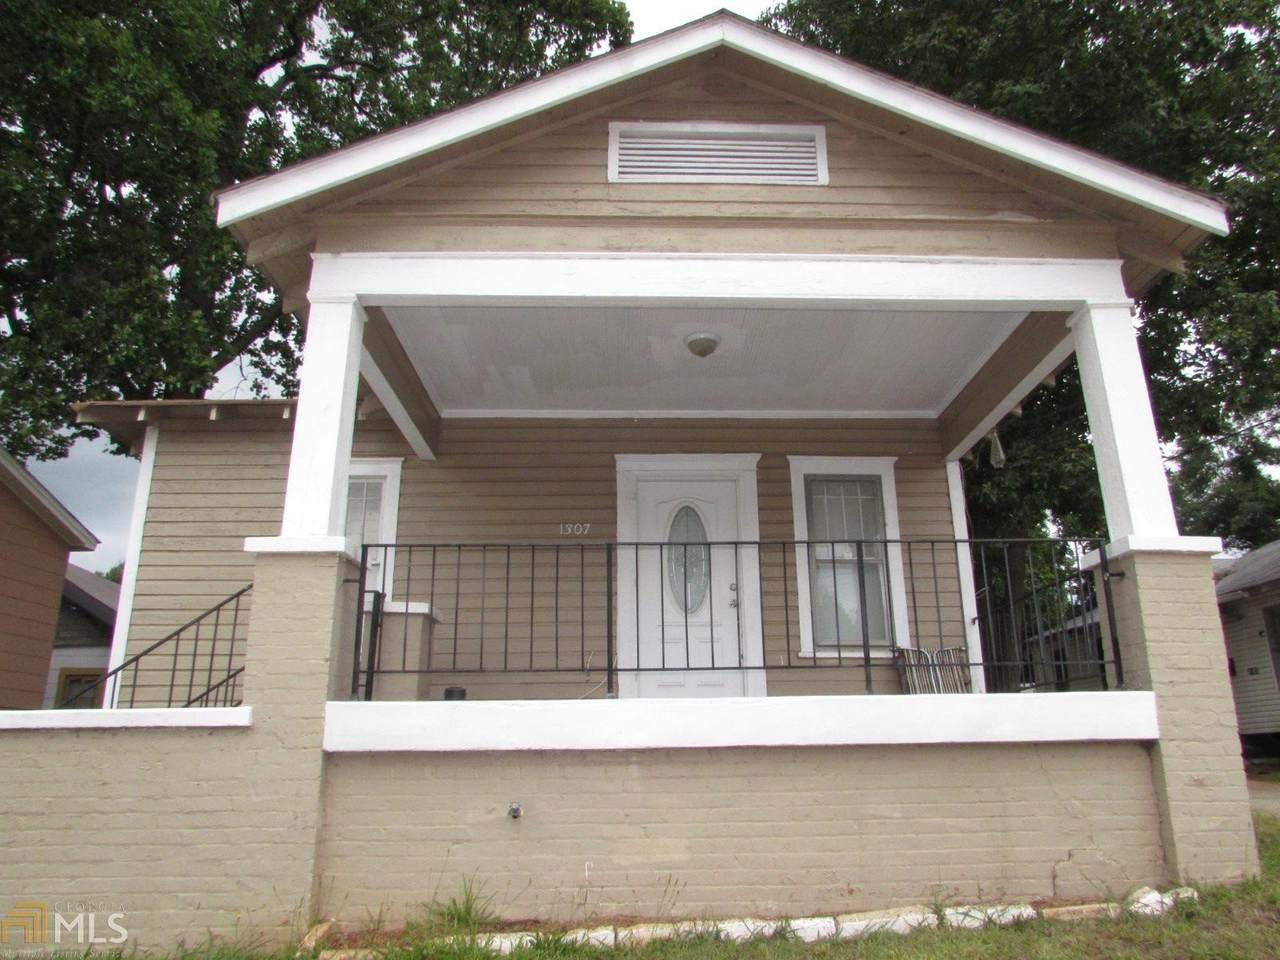 1307 Knotts Ave - Photo 1